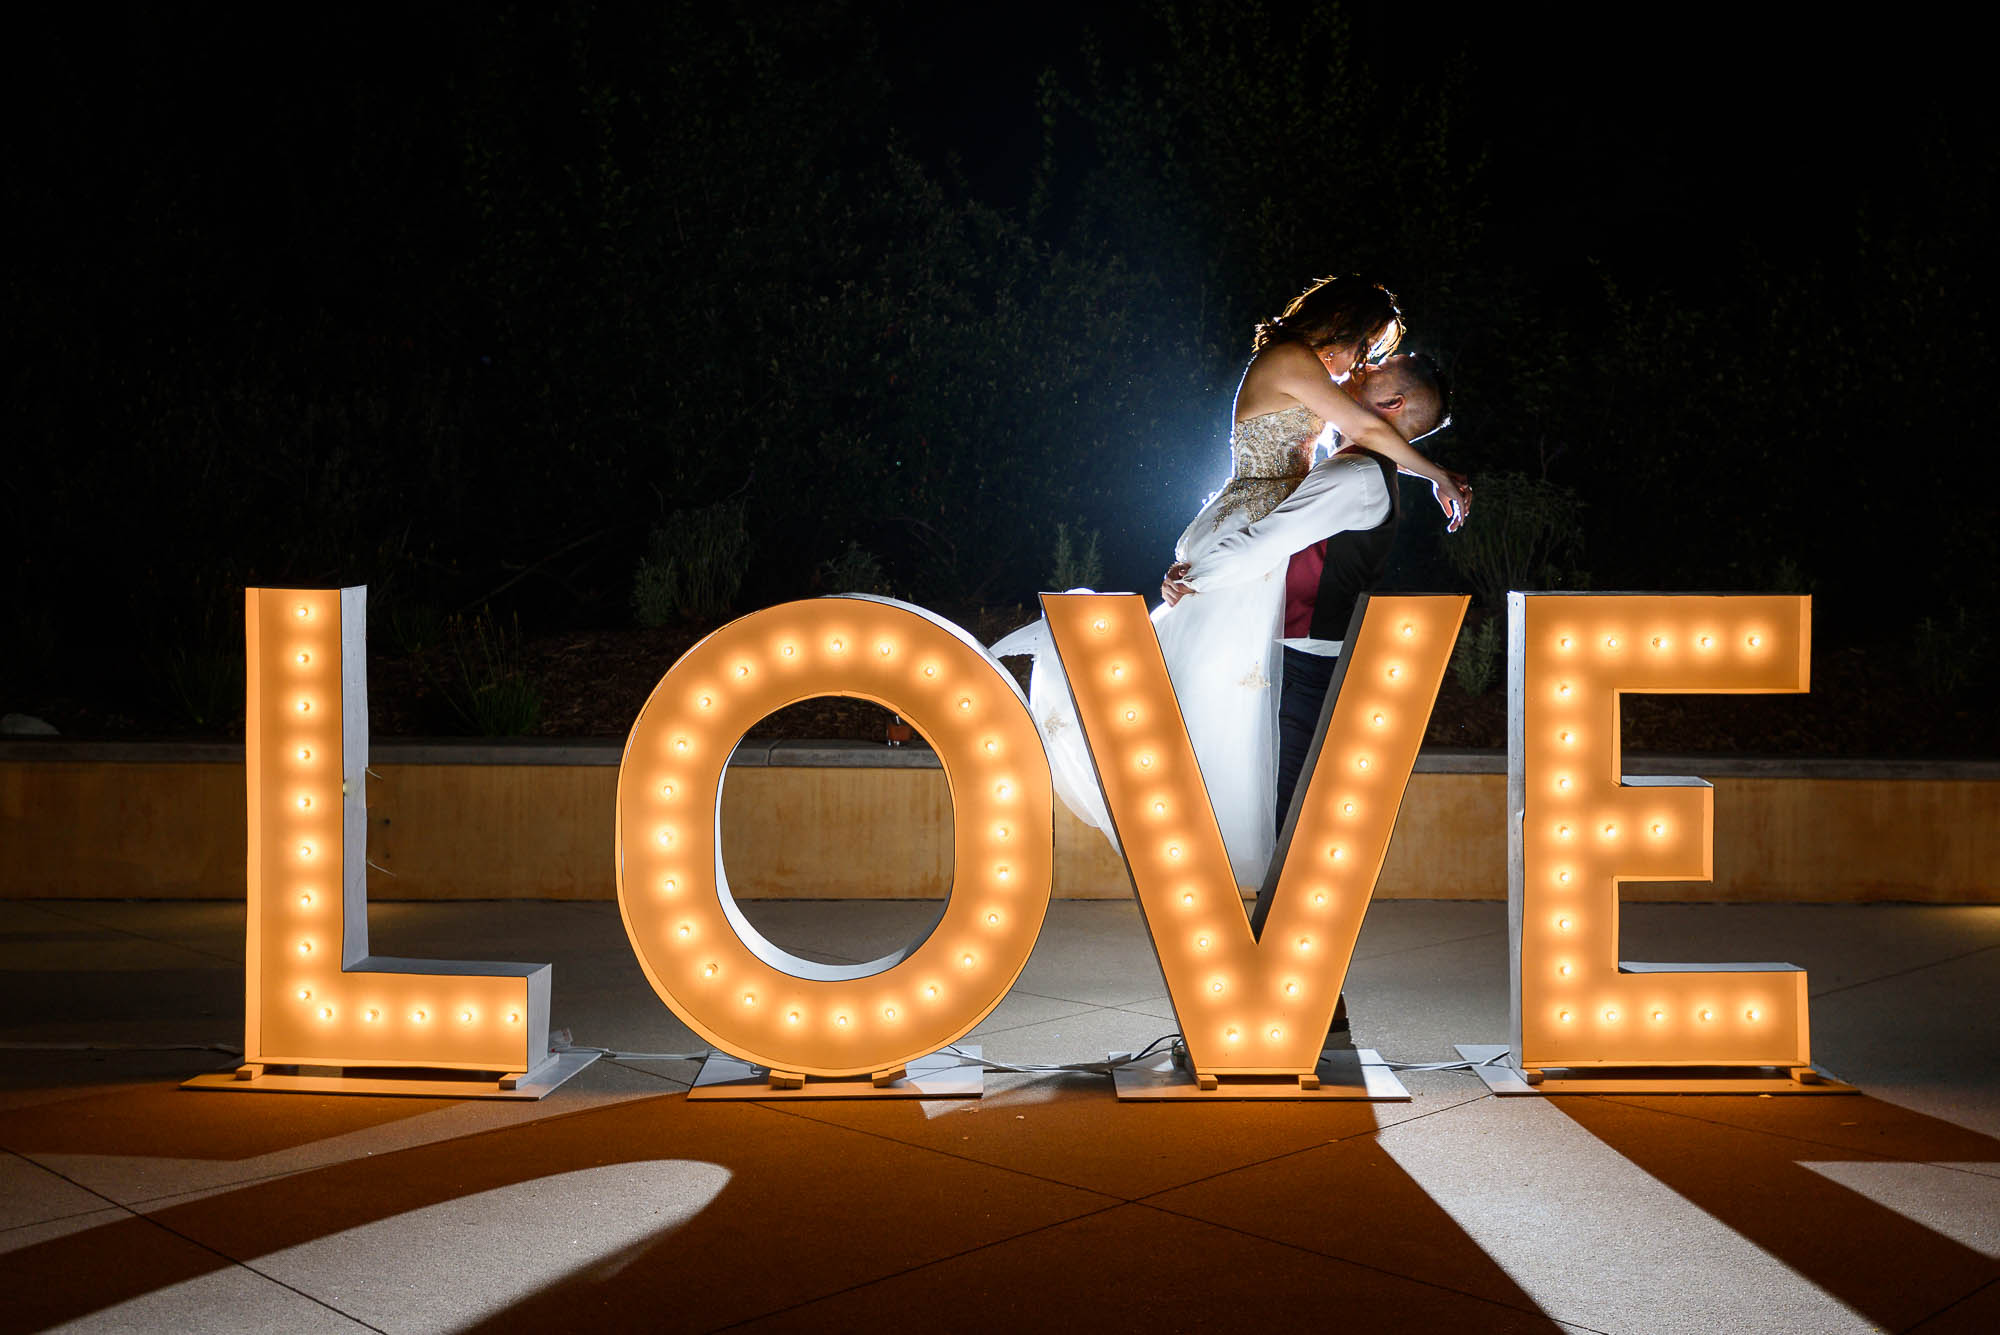 047_Alan_and_Heidi_Wedding_Karla_Paolo